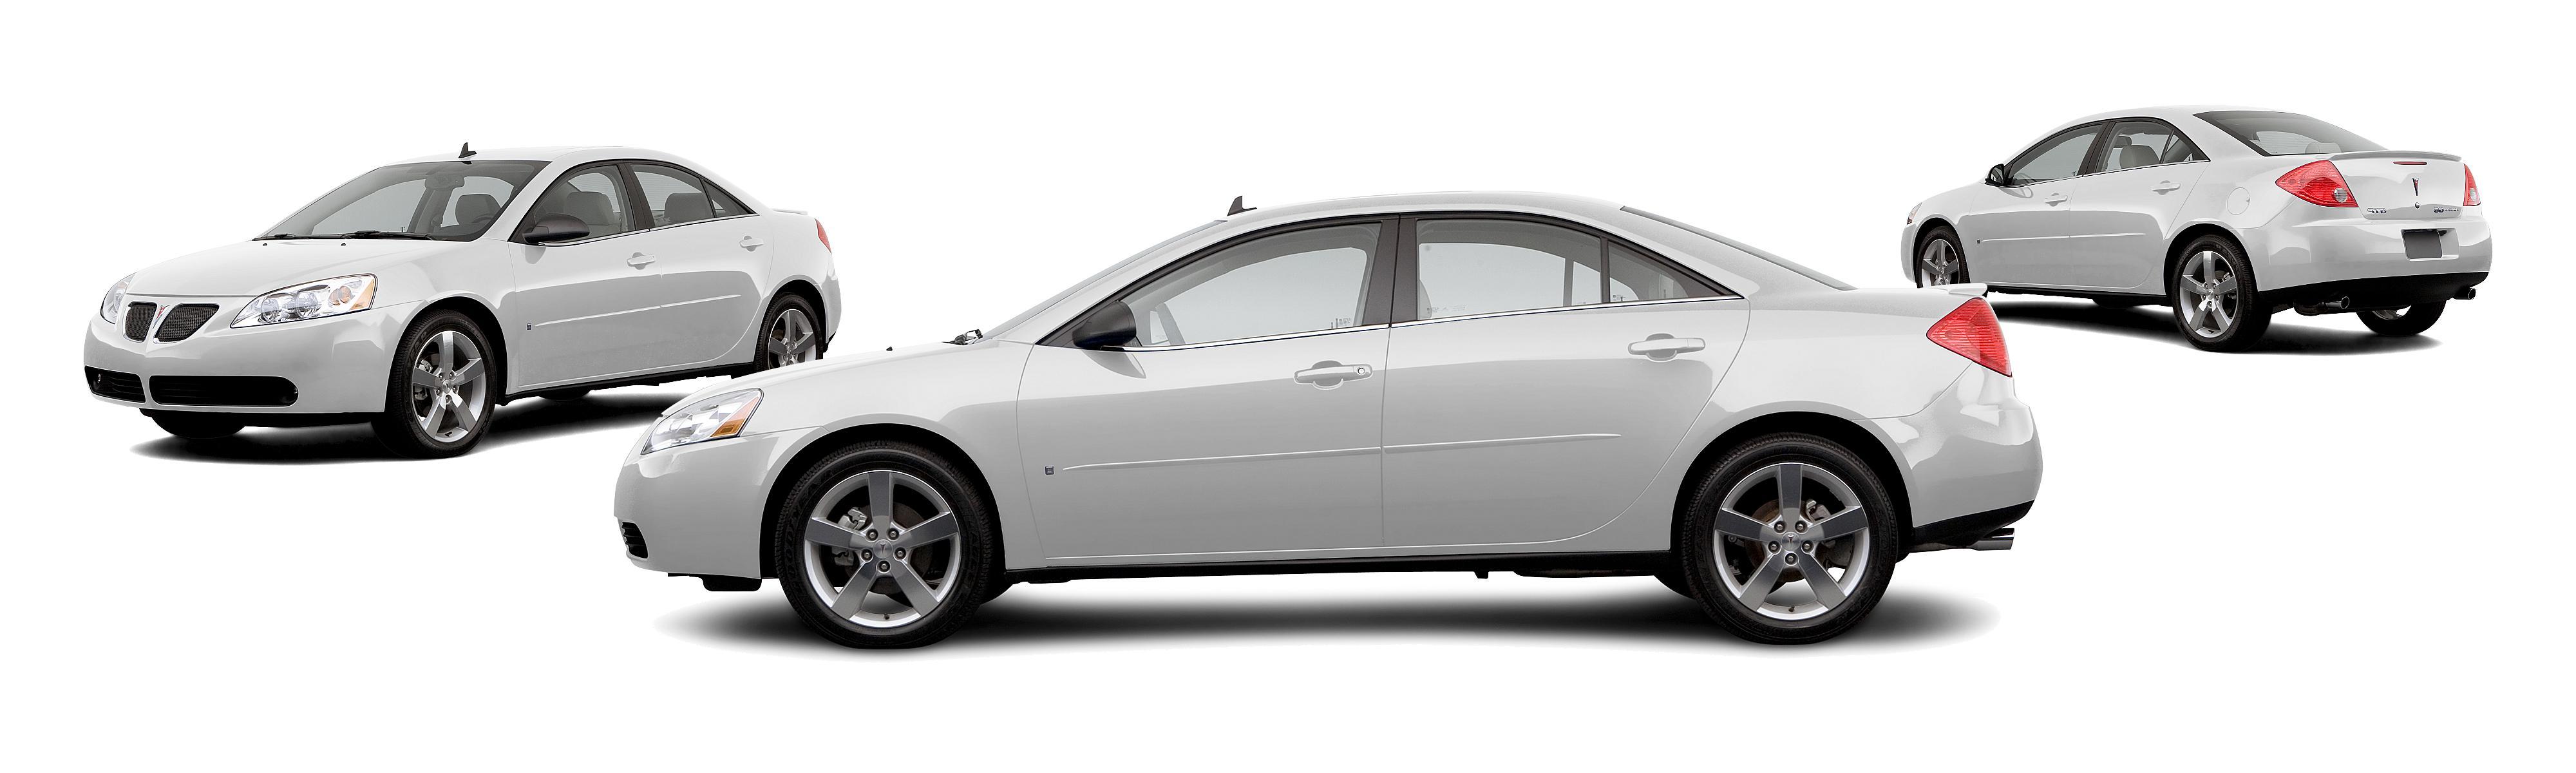 2007 pontiac g6 gt 4dr sedan research groovecar rh groovecar com